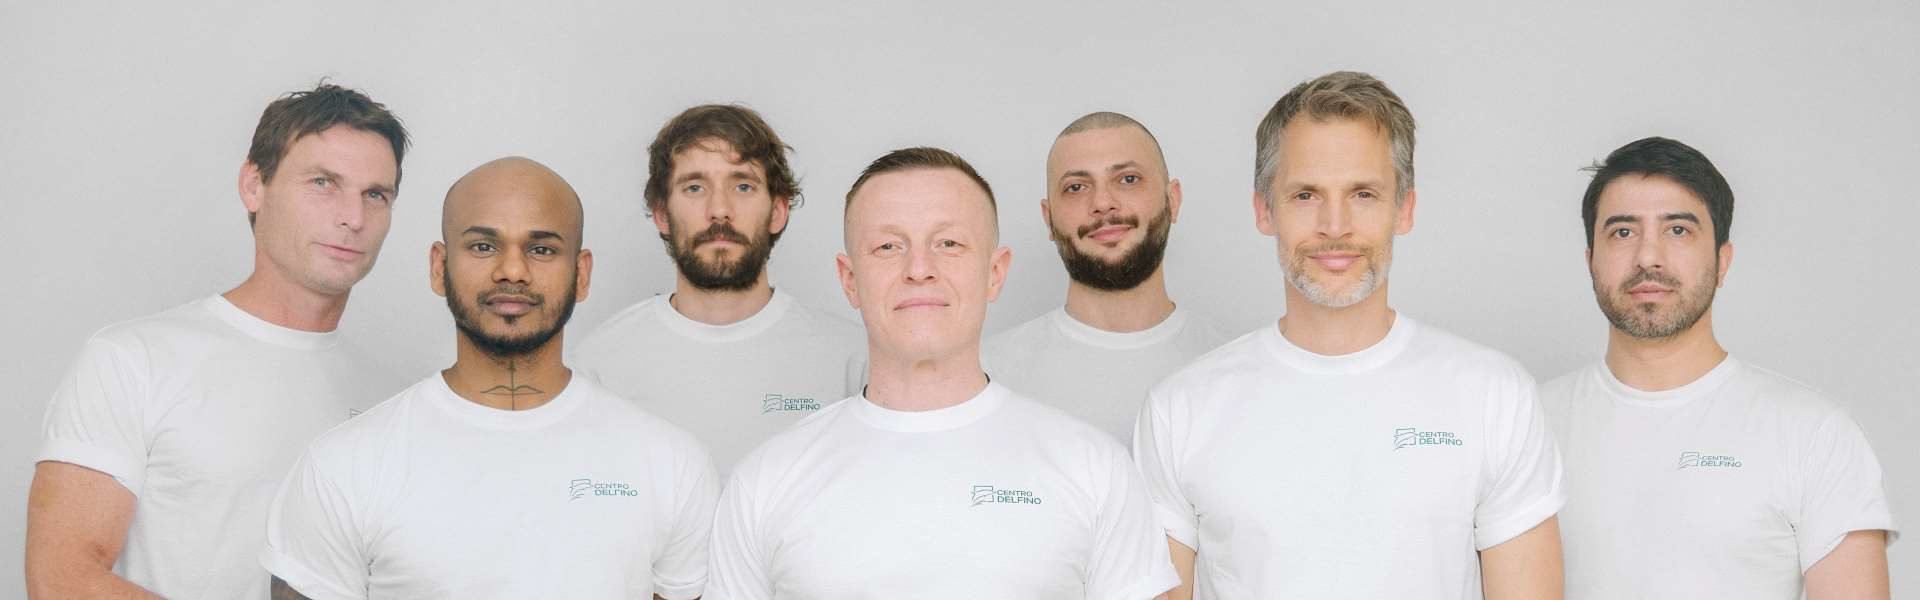 Centro Delfino Teamfoto Studio Schöneberg 2018